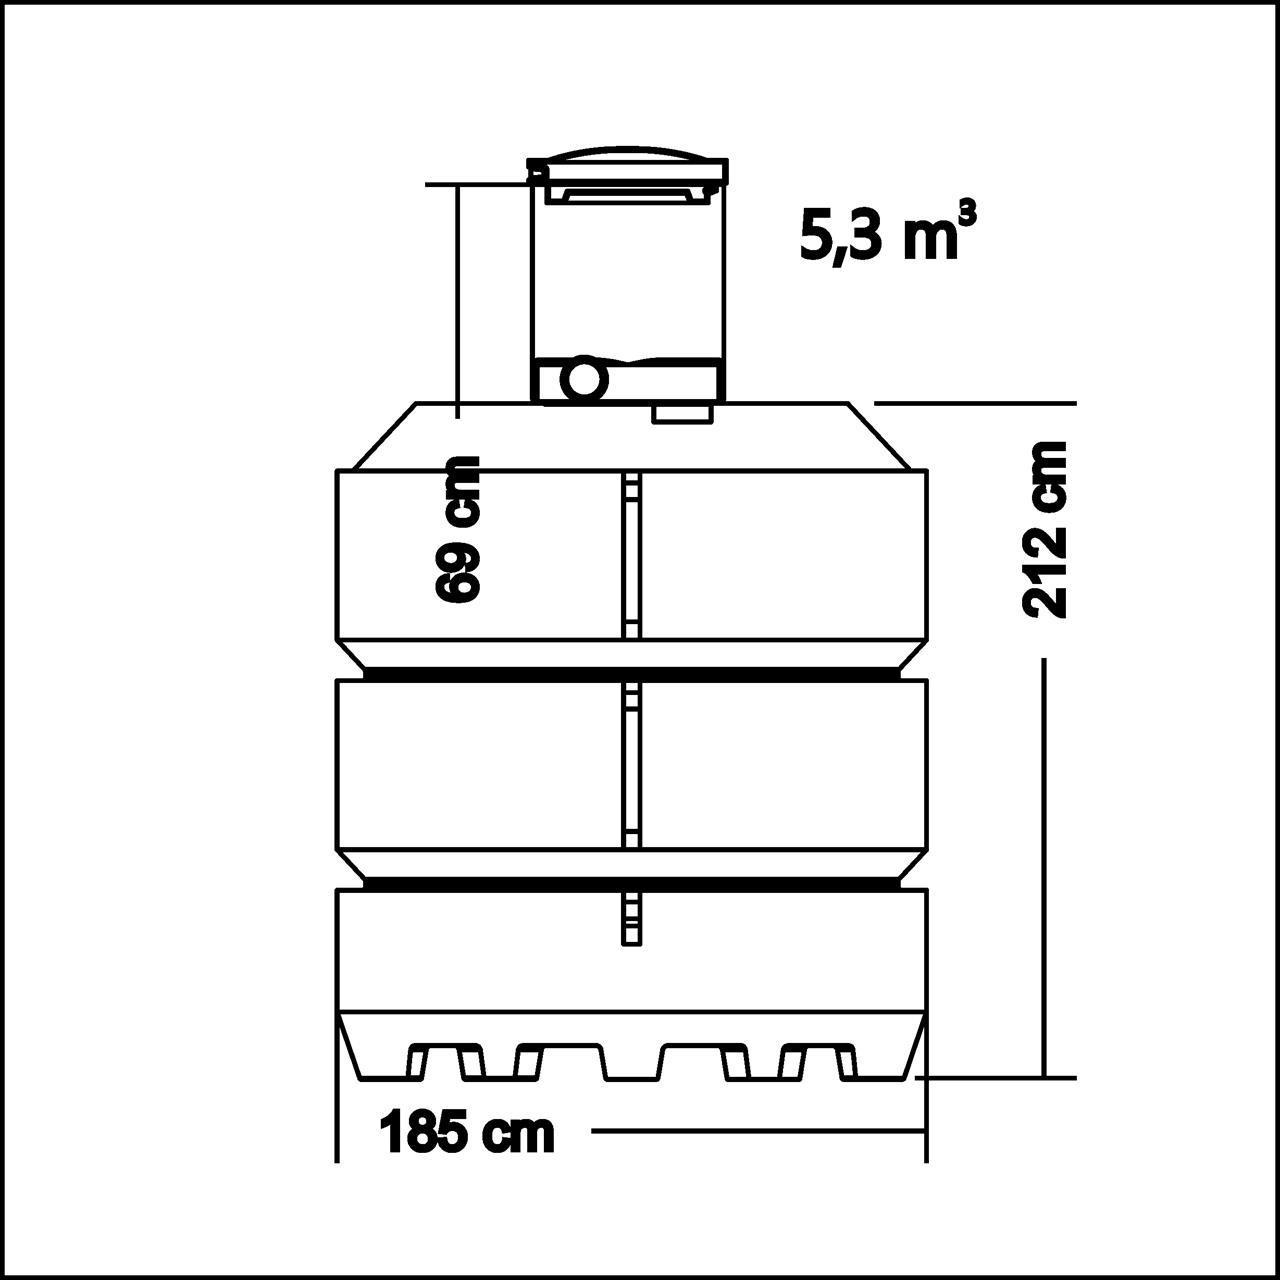 Umpisäiliö 5300 l, (tuloputki kork 2,12m), D600 H690 kuilulla